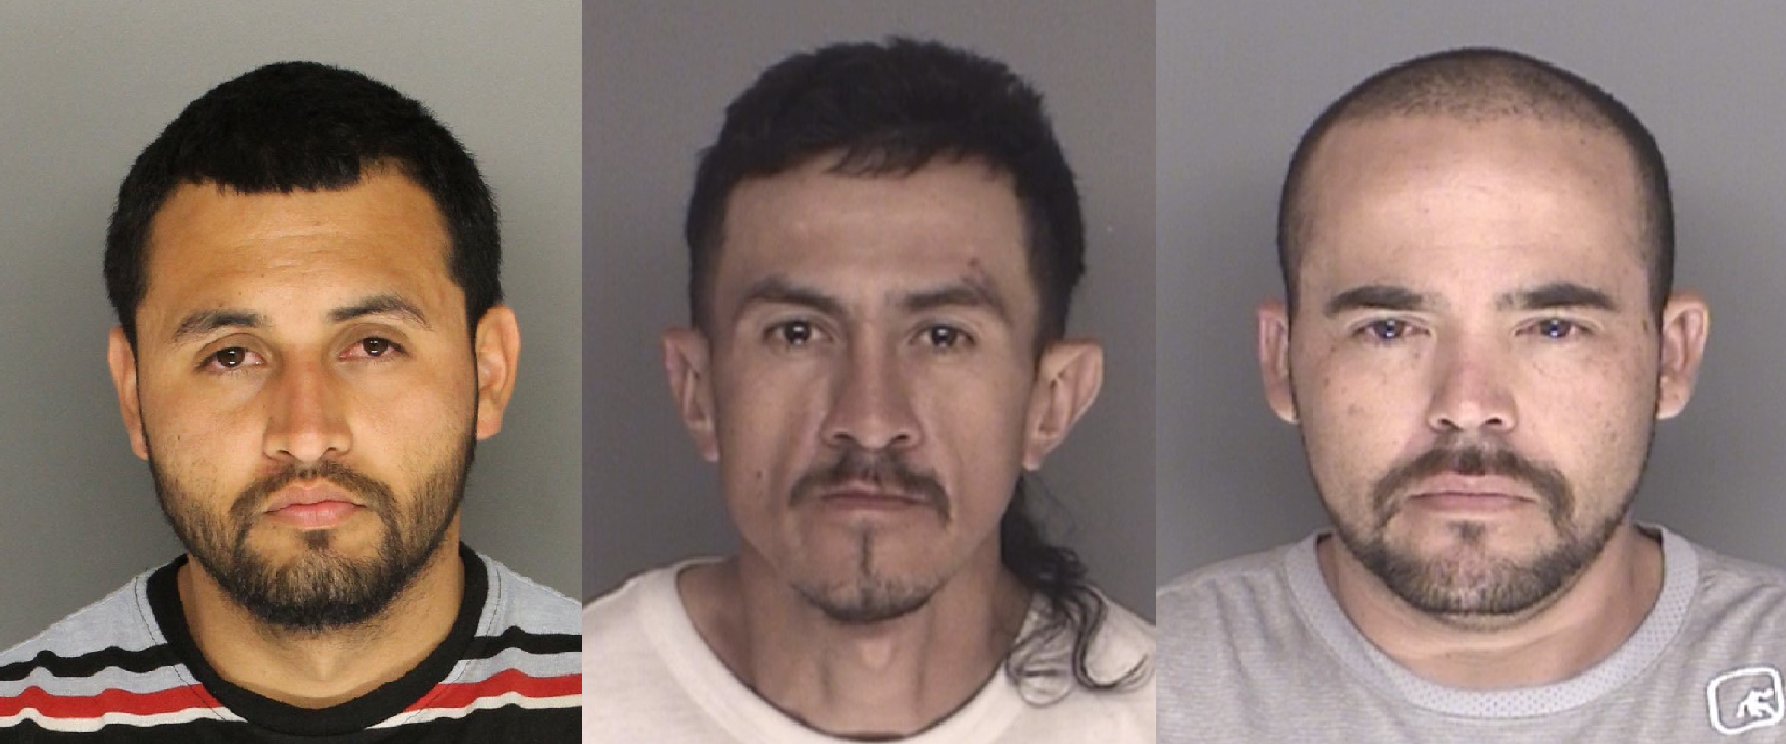 Daniel Vargas, left. Francisco Lozano, middle. Juan Rodriguez, right.